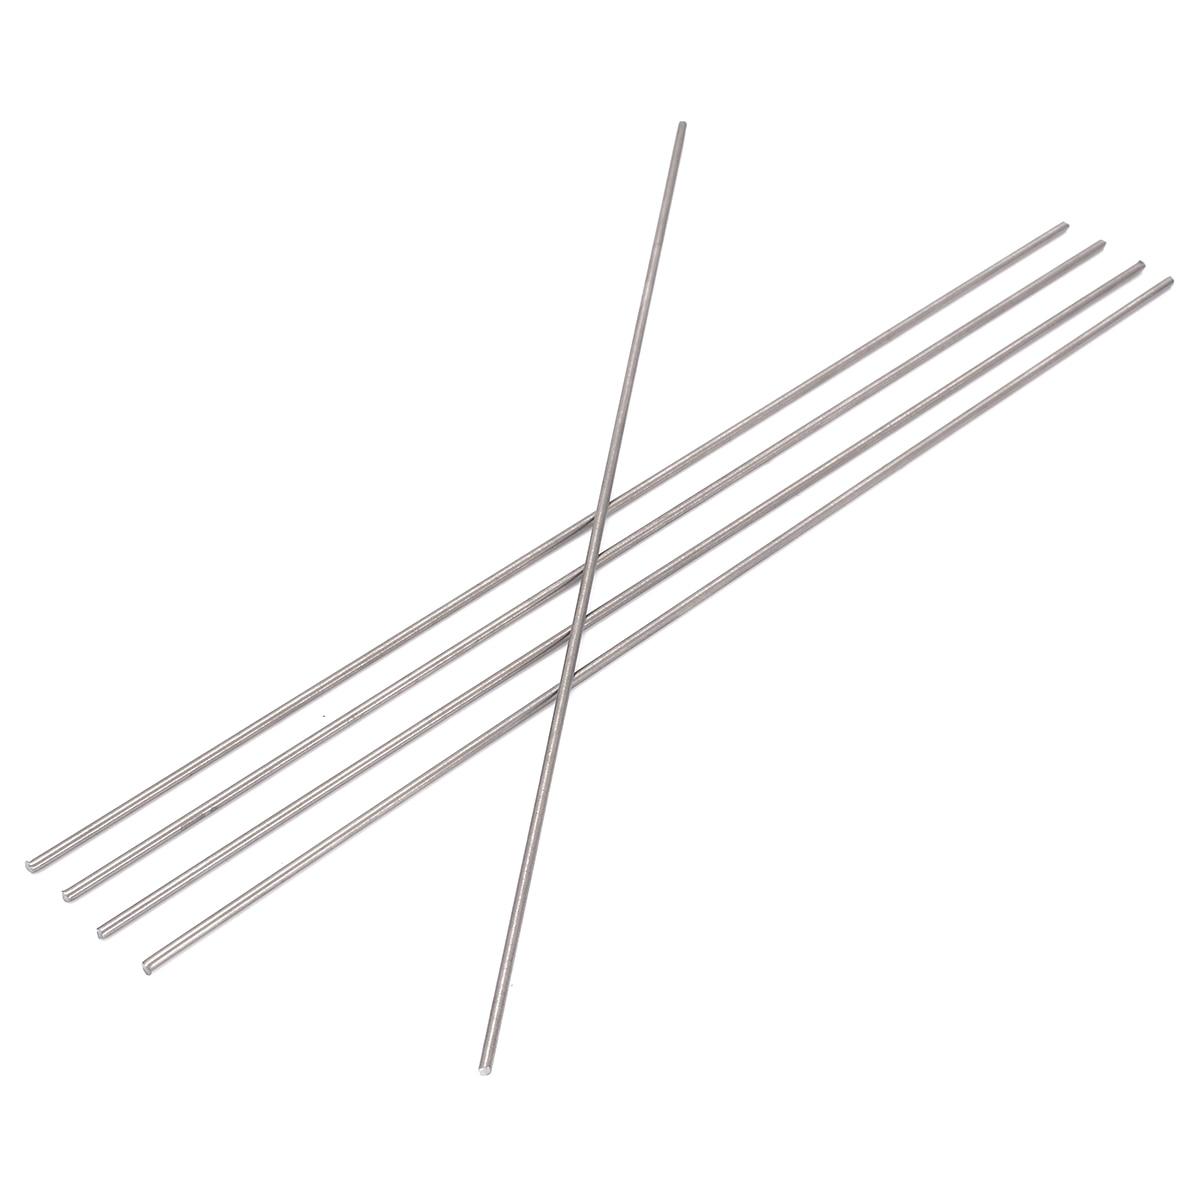 5pcs Round Ti Bar Grade 5 Metal Rods 2*250mm Titanium Sticks For Manufacturing Gas Turbine Components